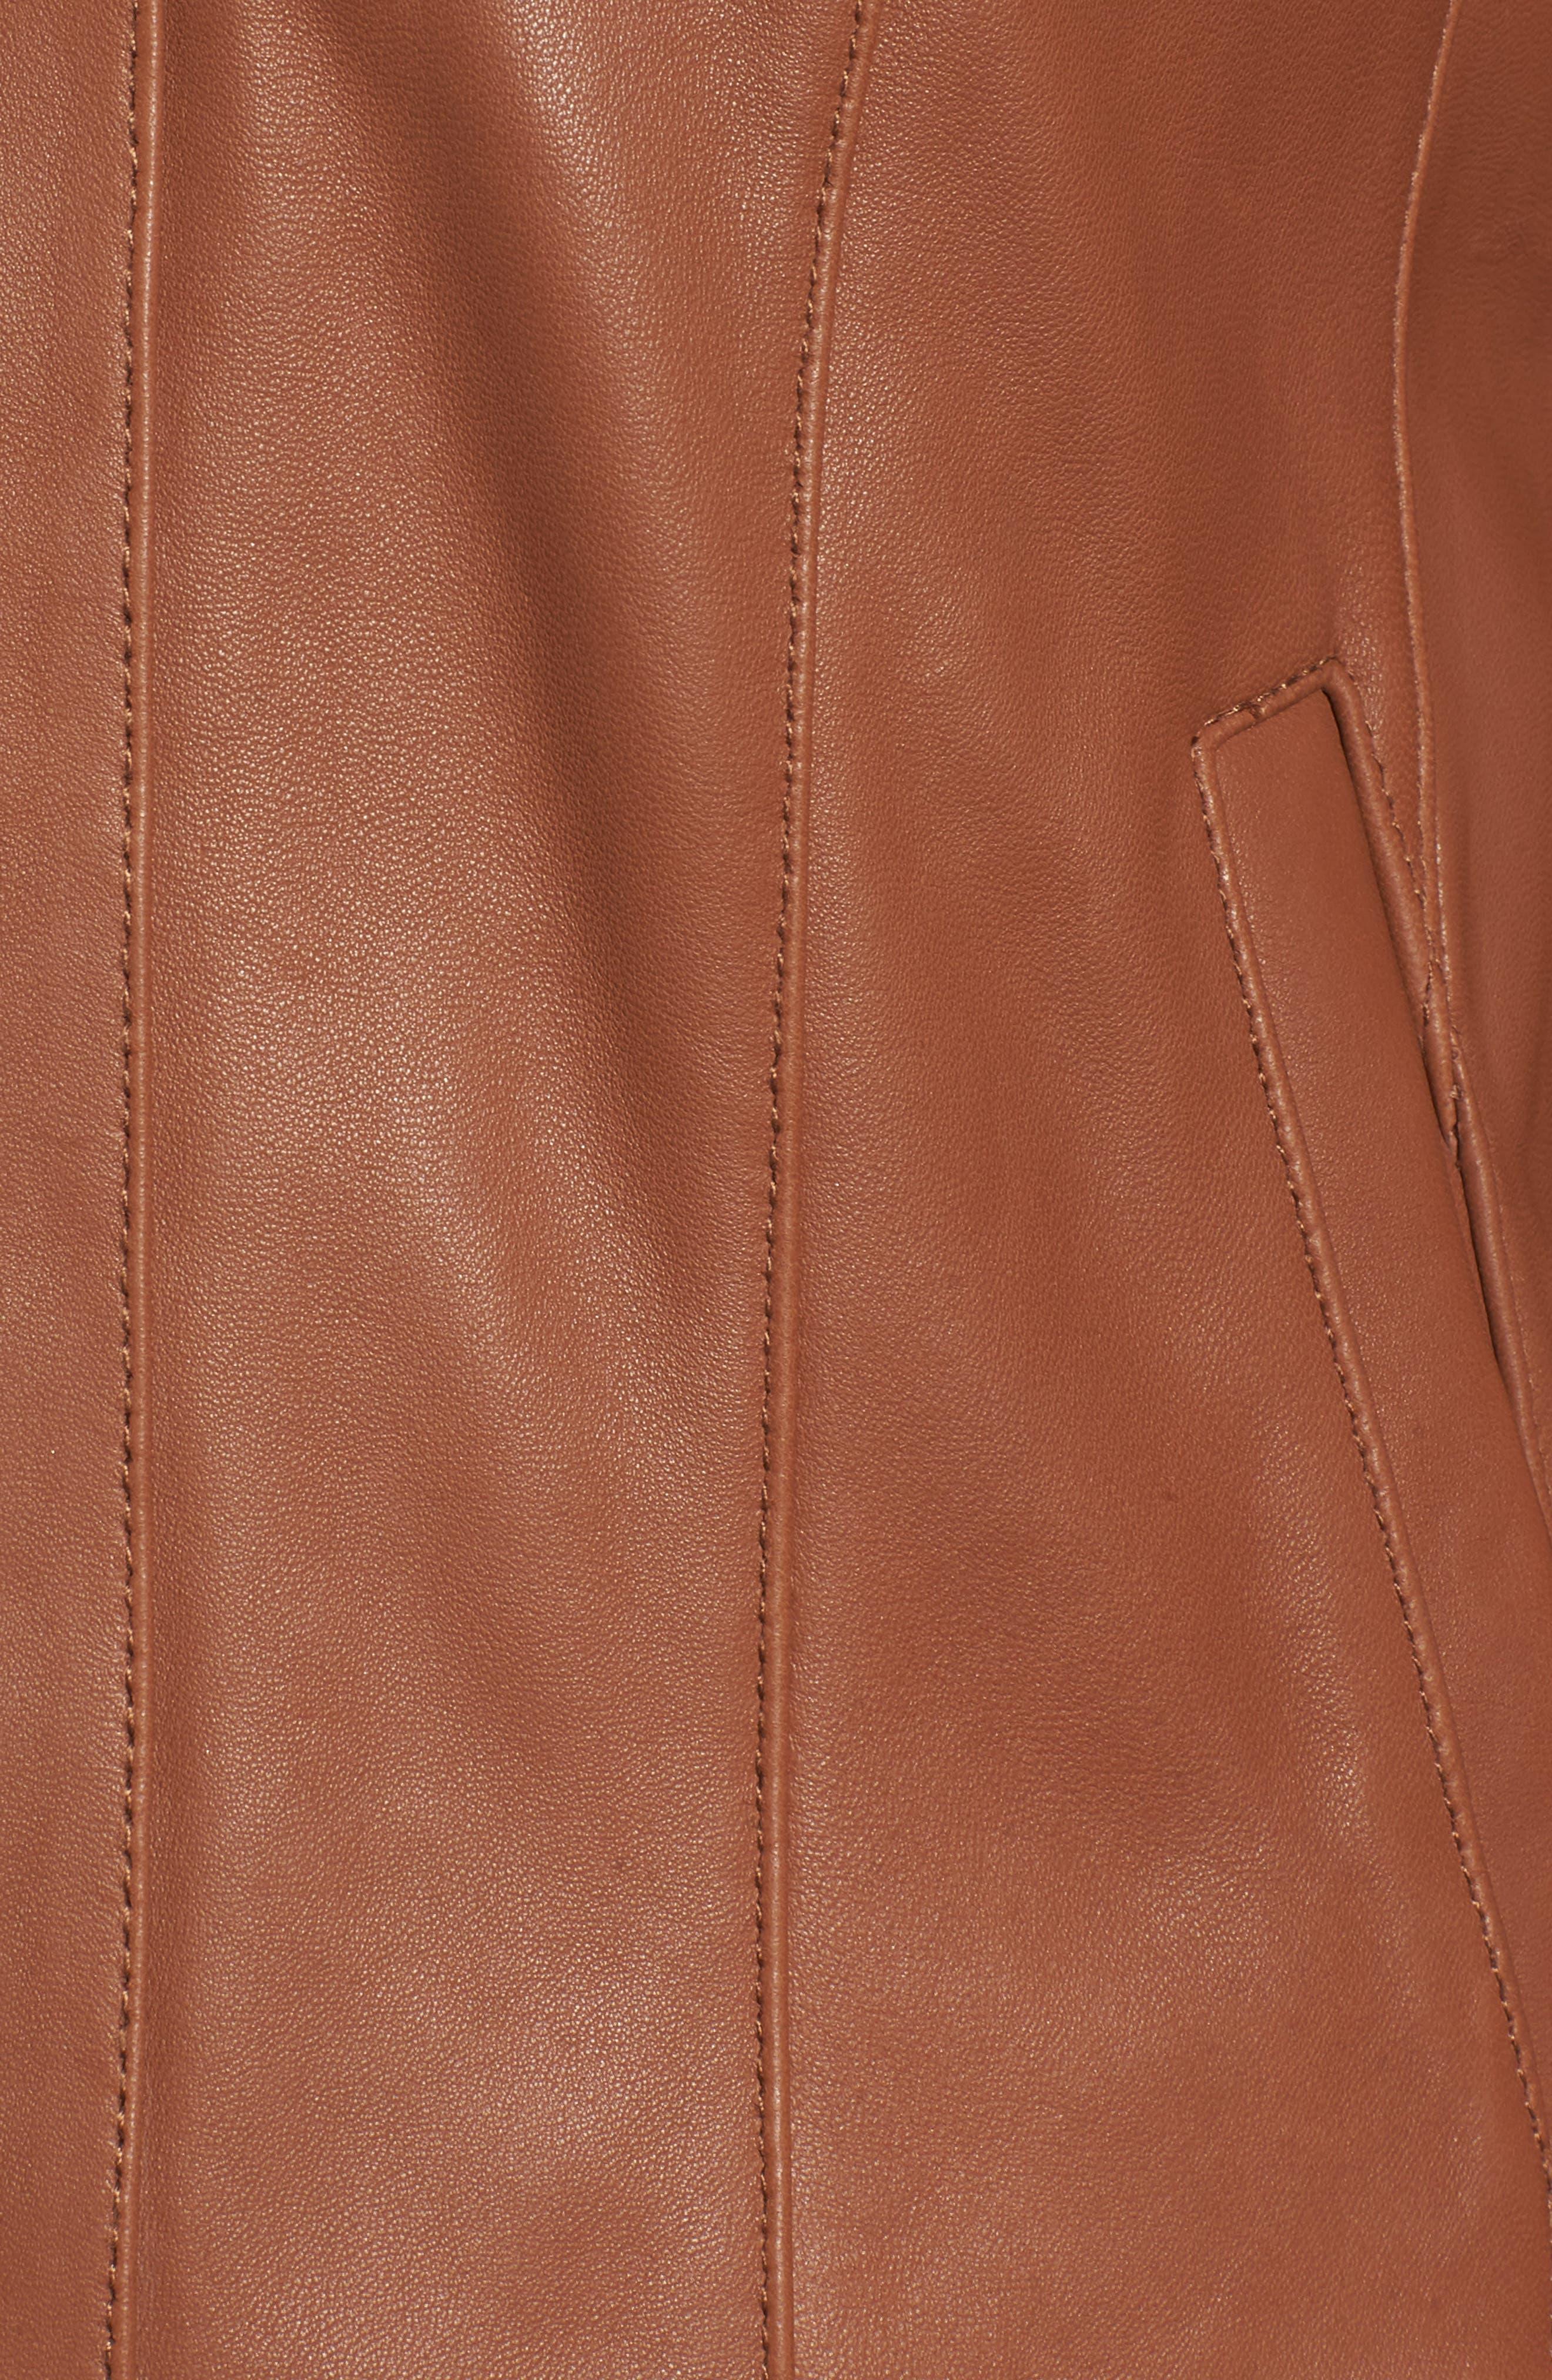 Leather Moto Jacket,                             Alternate thumbnail 6, color,                             NO_COLOR